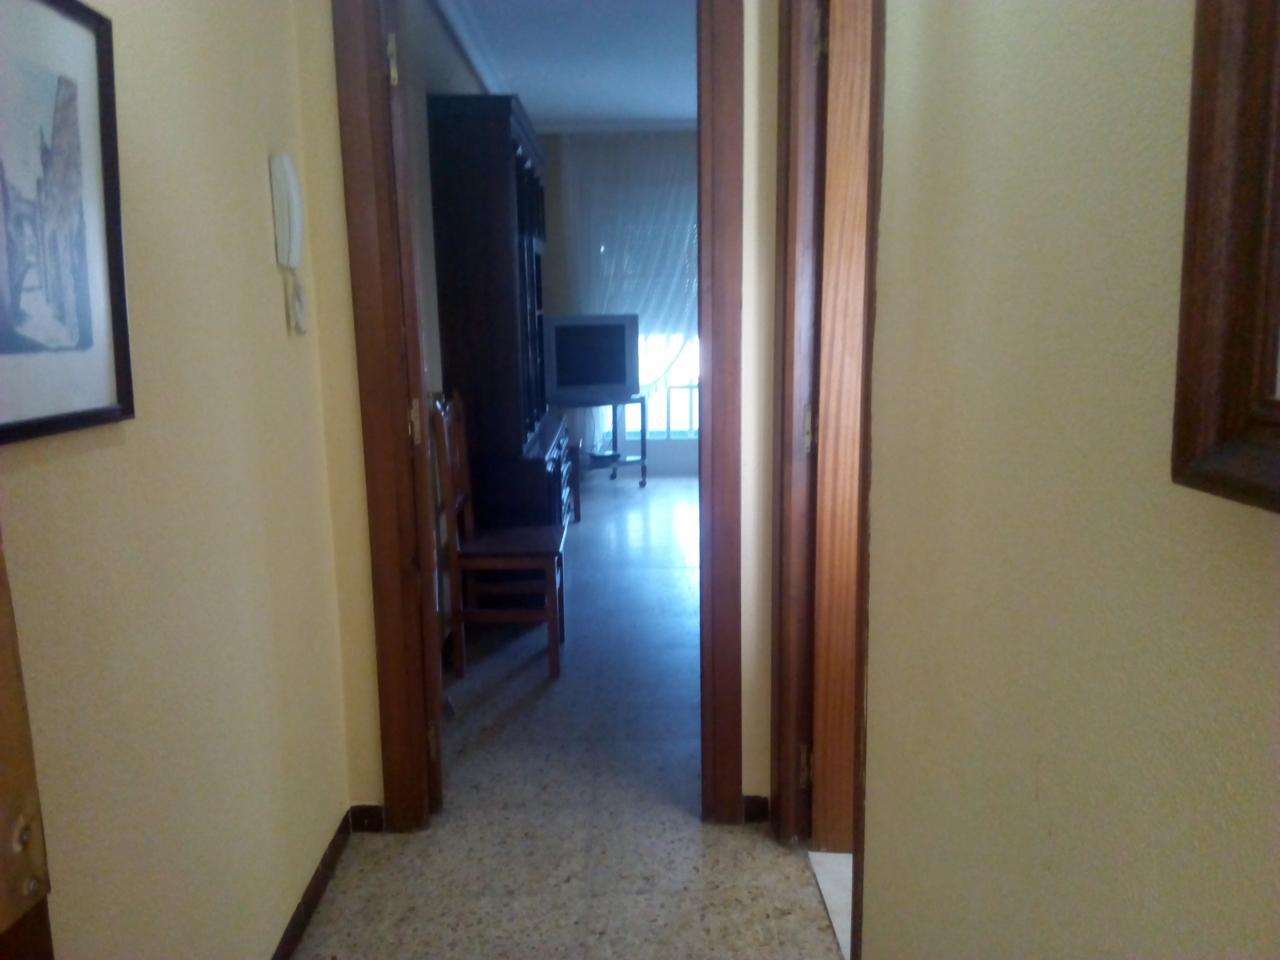 Piso en alquiler larga duración con 100 m2, 4 dormitorios  en Centro,